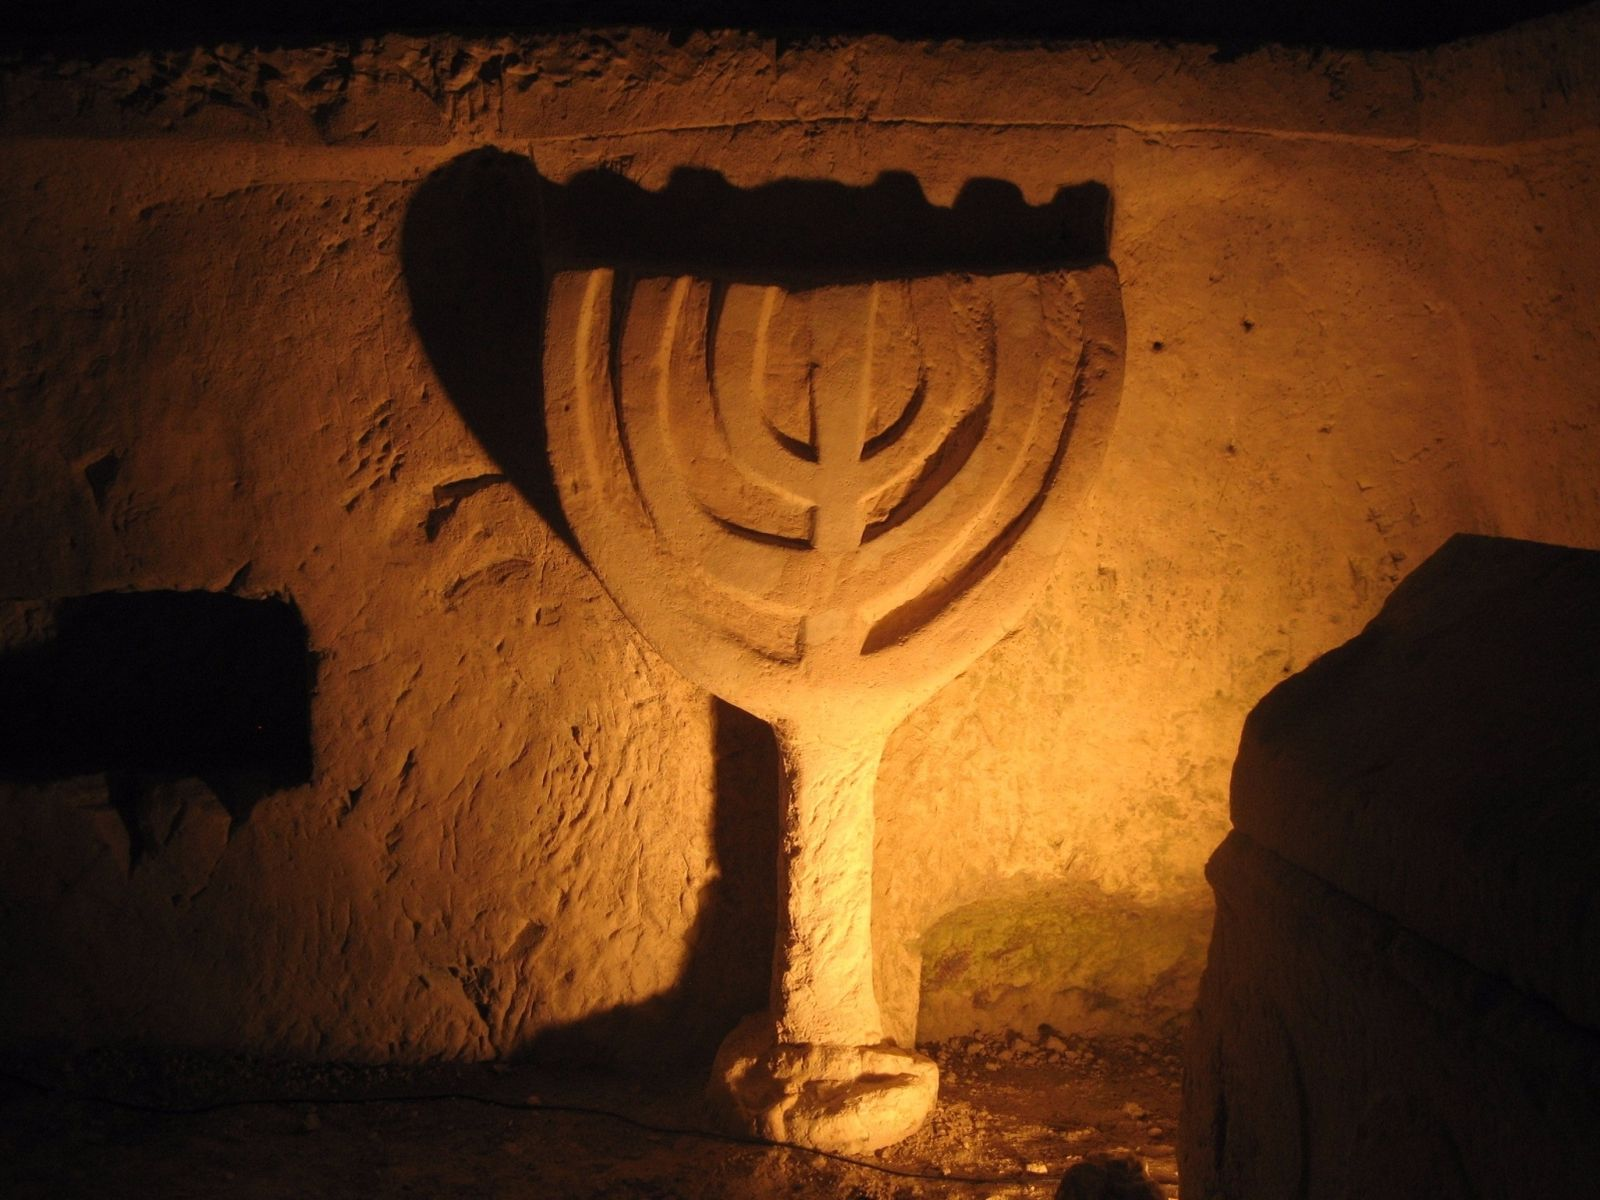 Catacomb 20 at Beit She'arim. Photo by Tsvika Tsuk/Israel Nature and Parks Authority